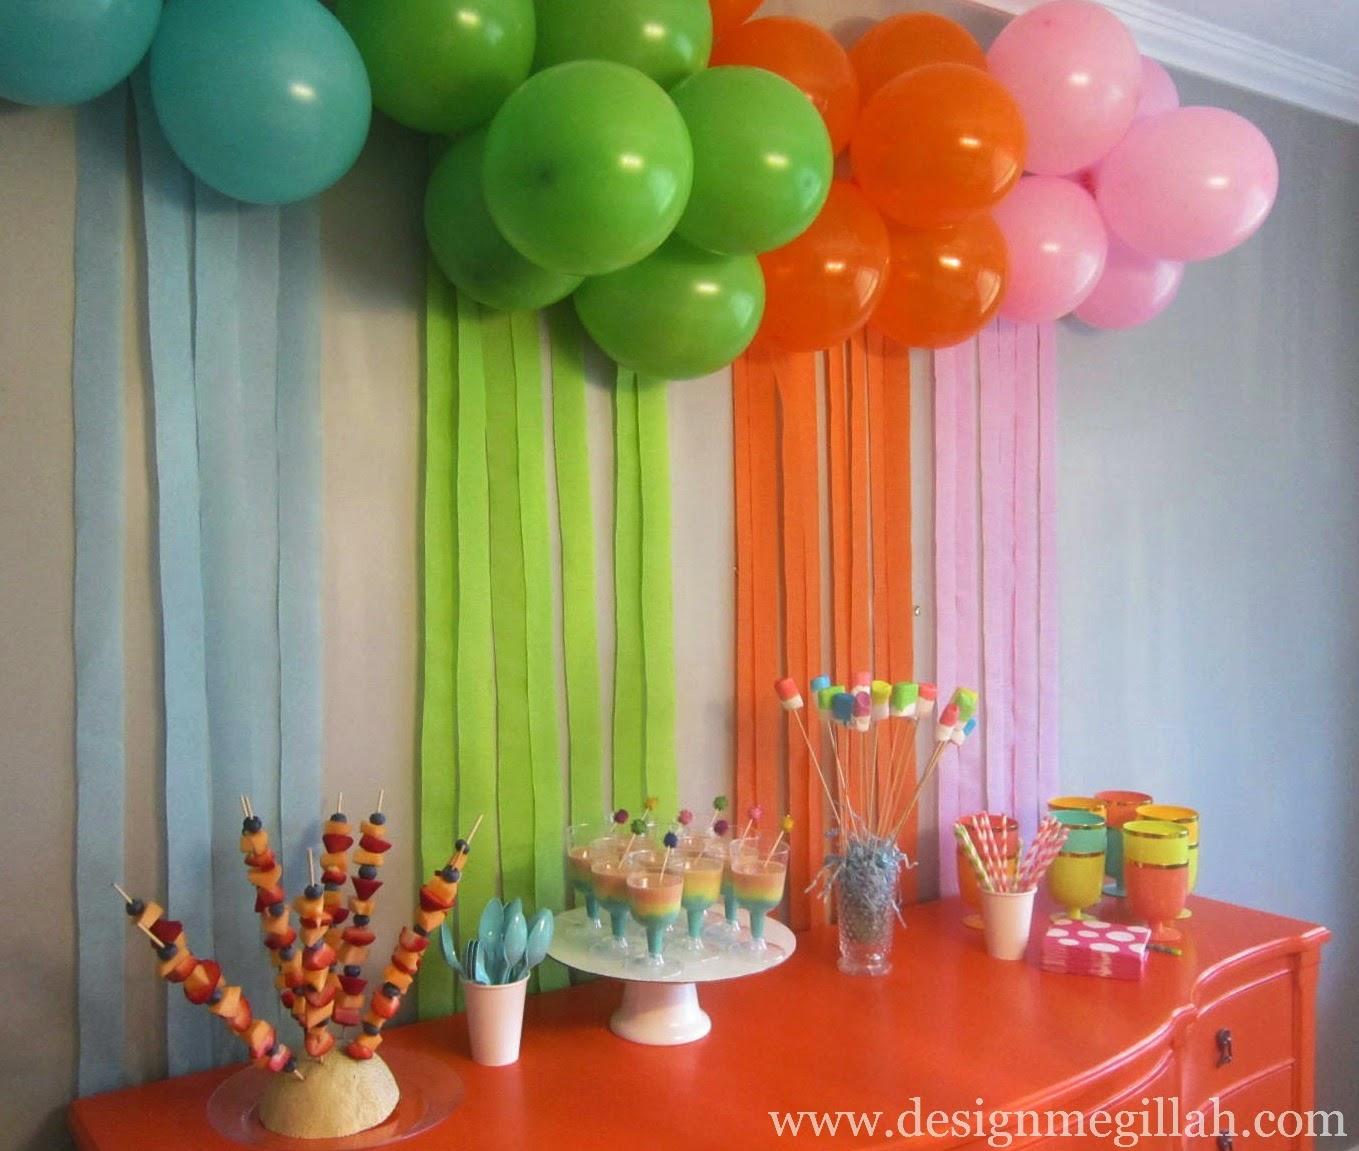 The Art Birthday Party